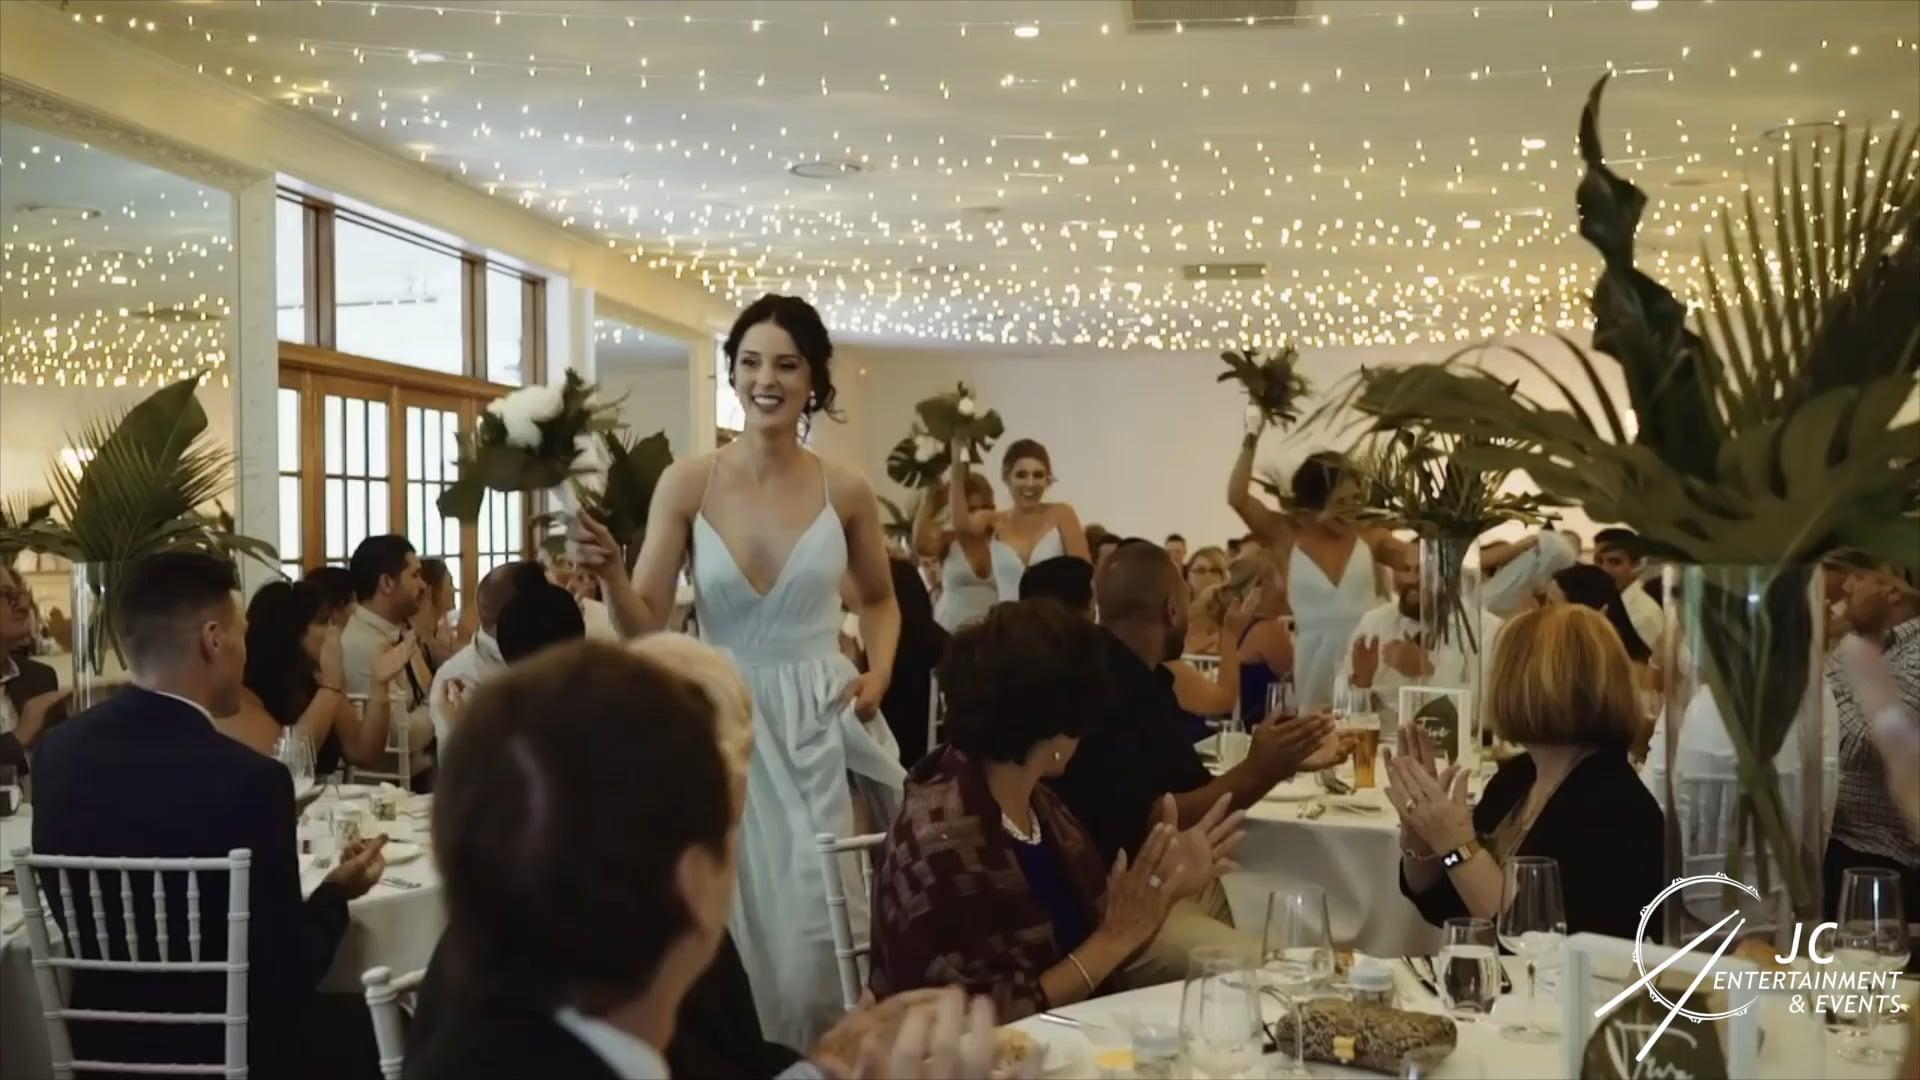 JC Entertainment & Events Weddings